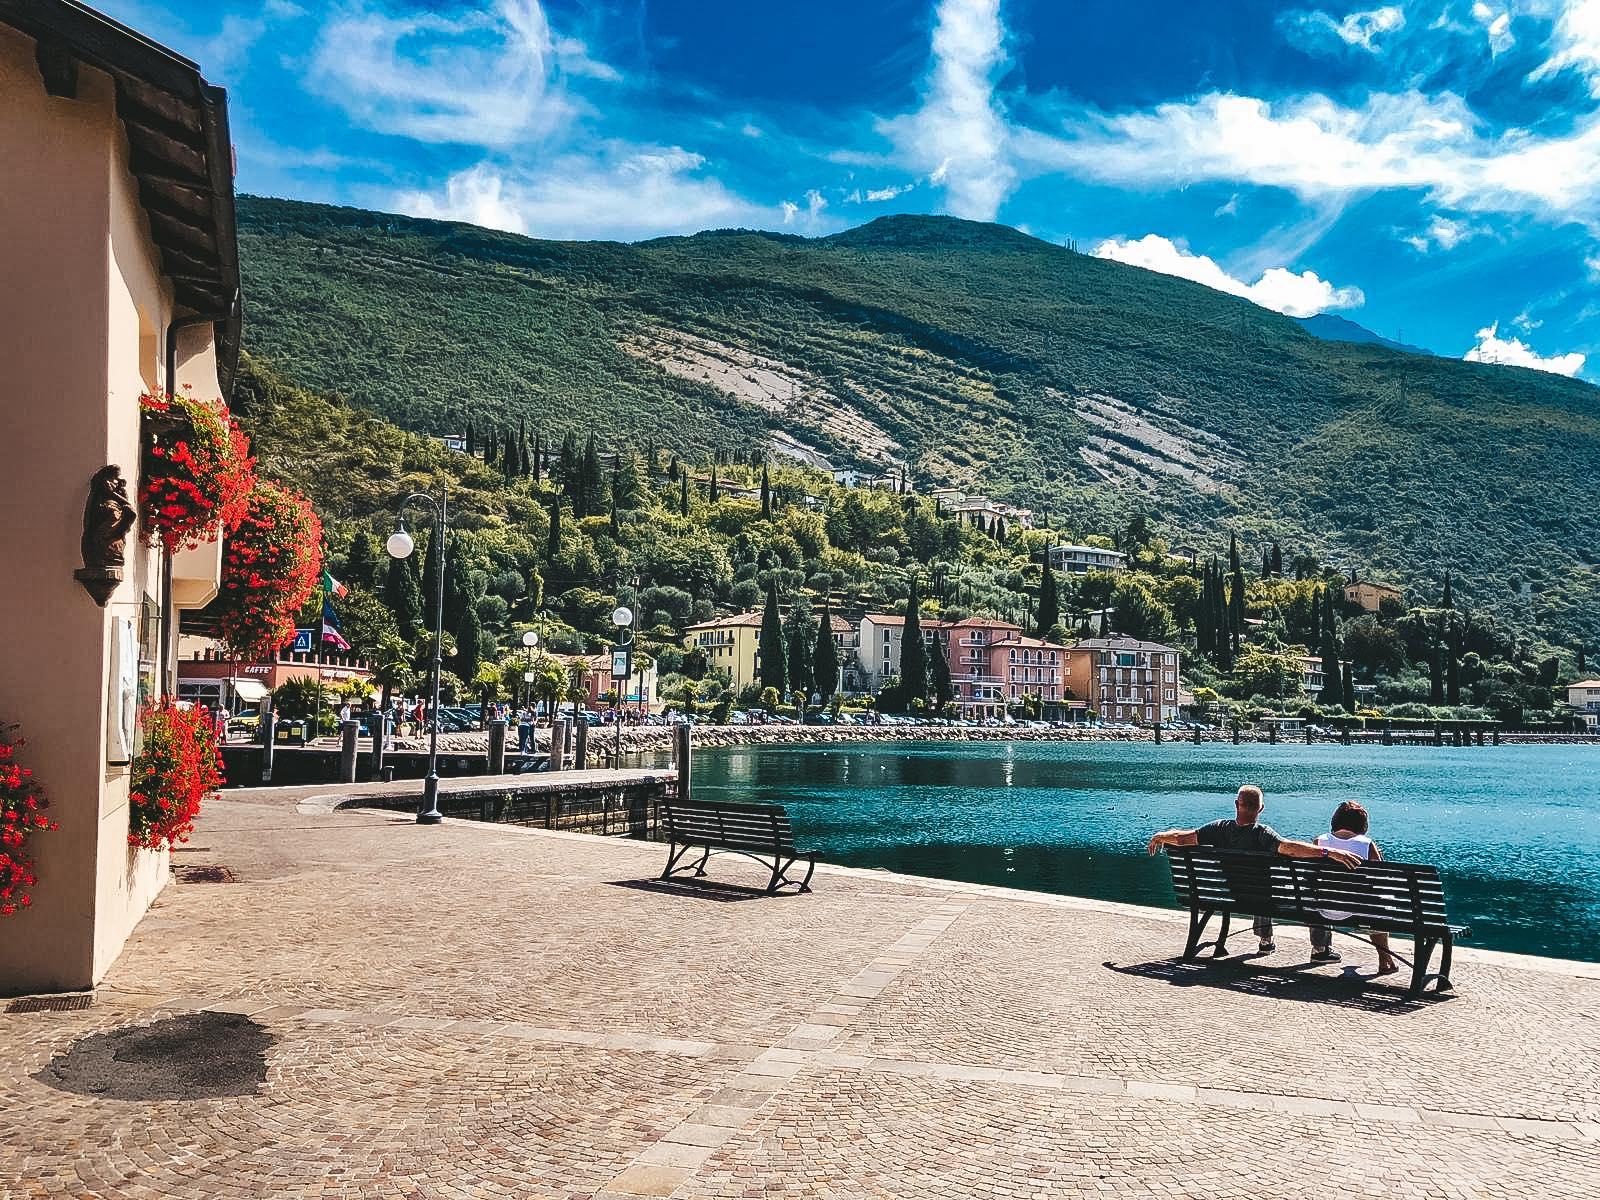 Life On The Road Day 131 Hello from Lago di Garda, ITALY22.jpg